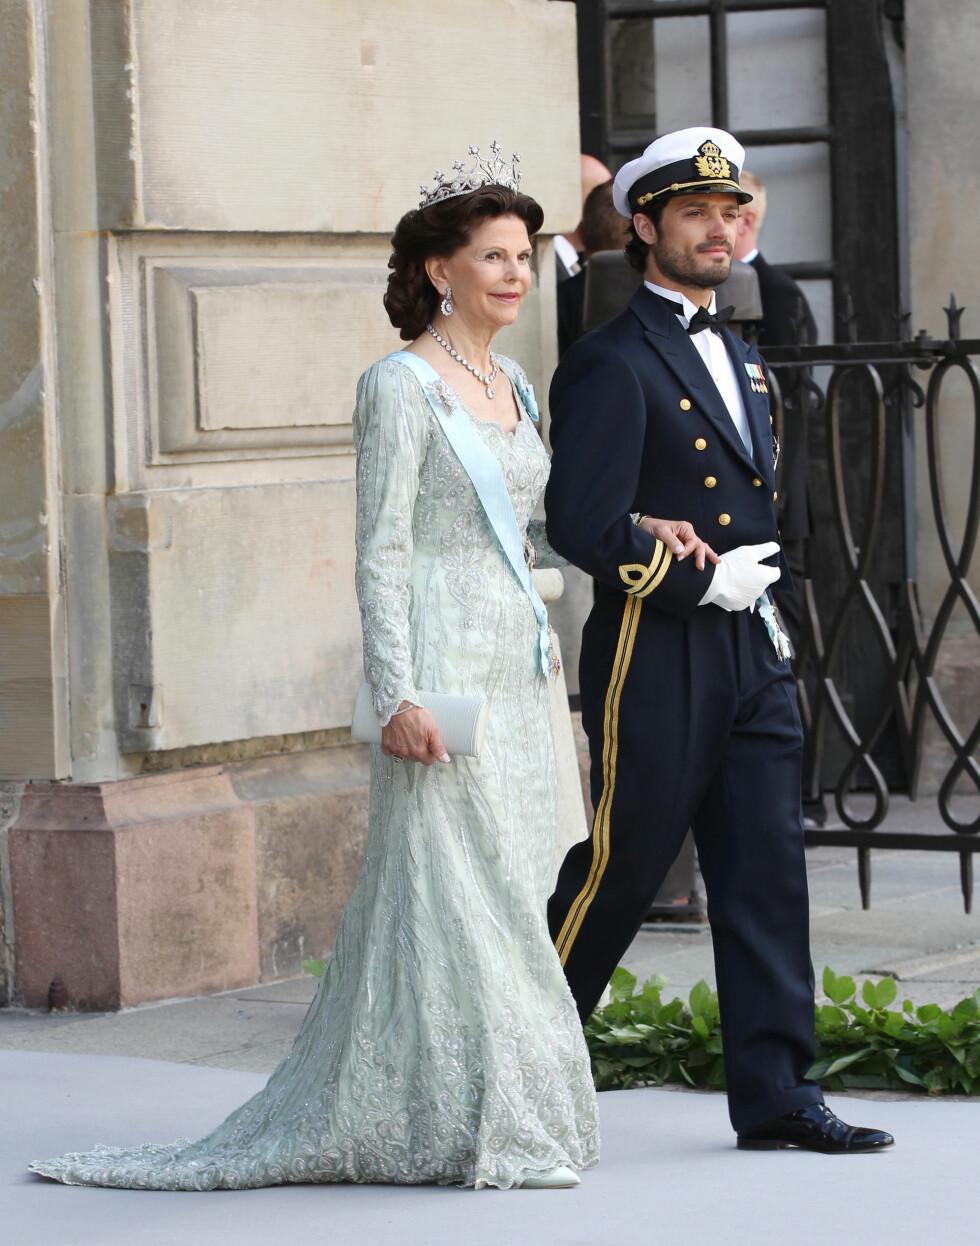 Dronning Silvia og prins Carl Philip. Foto: All Over Press